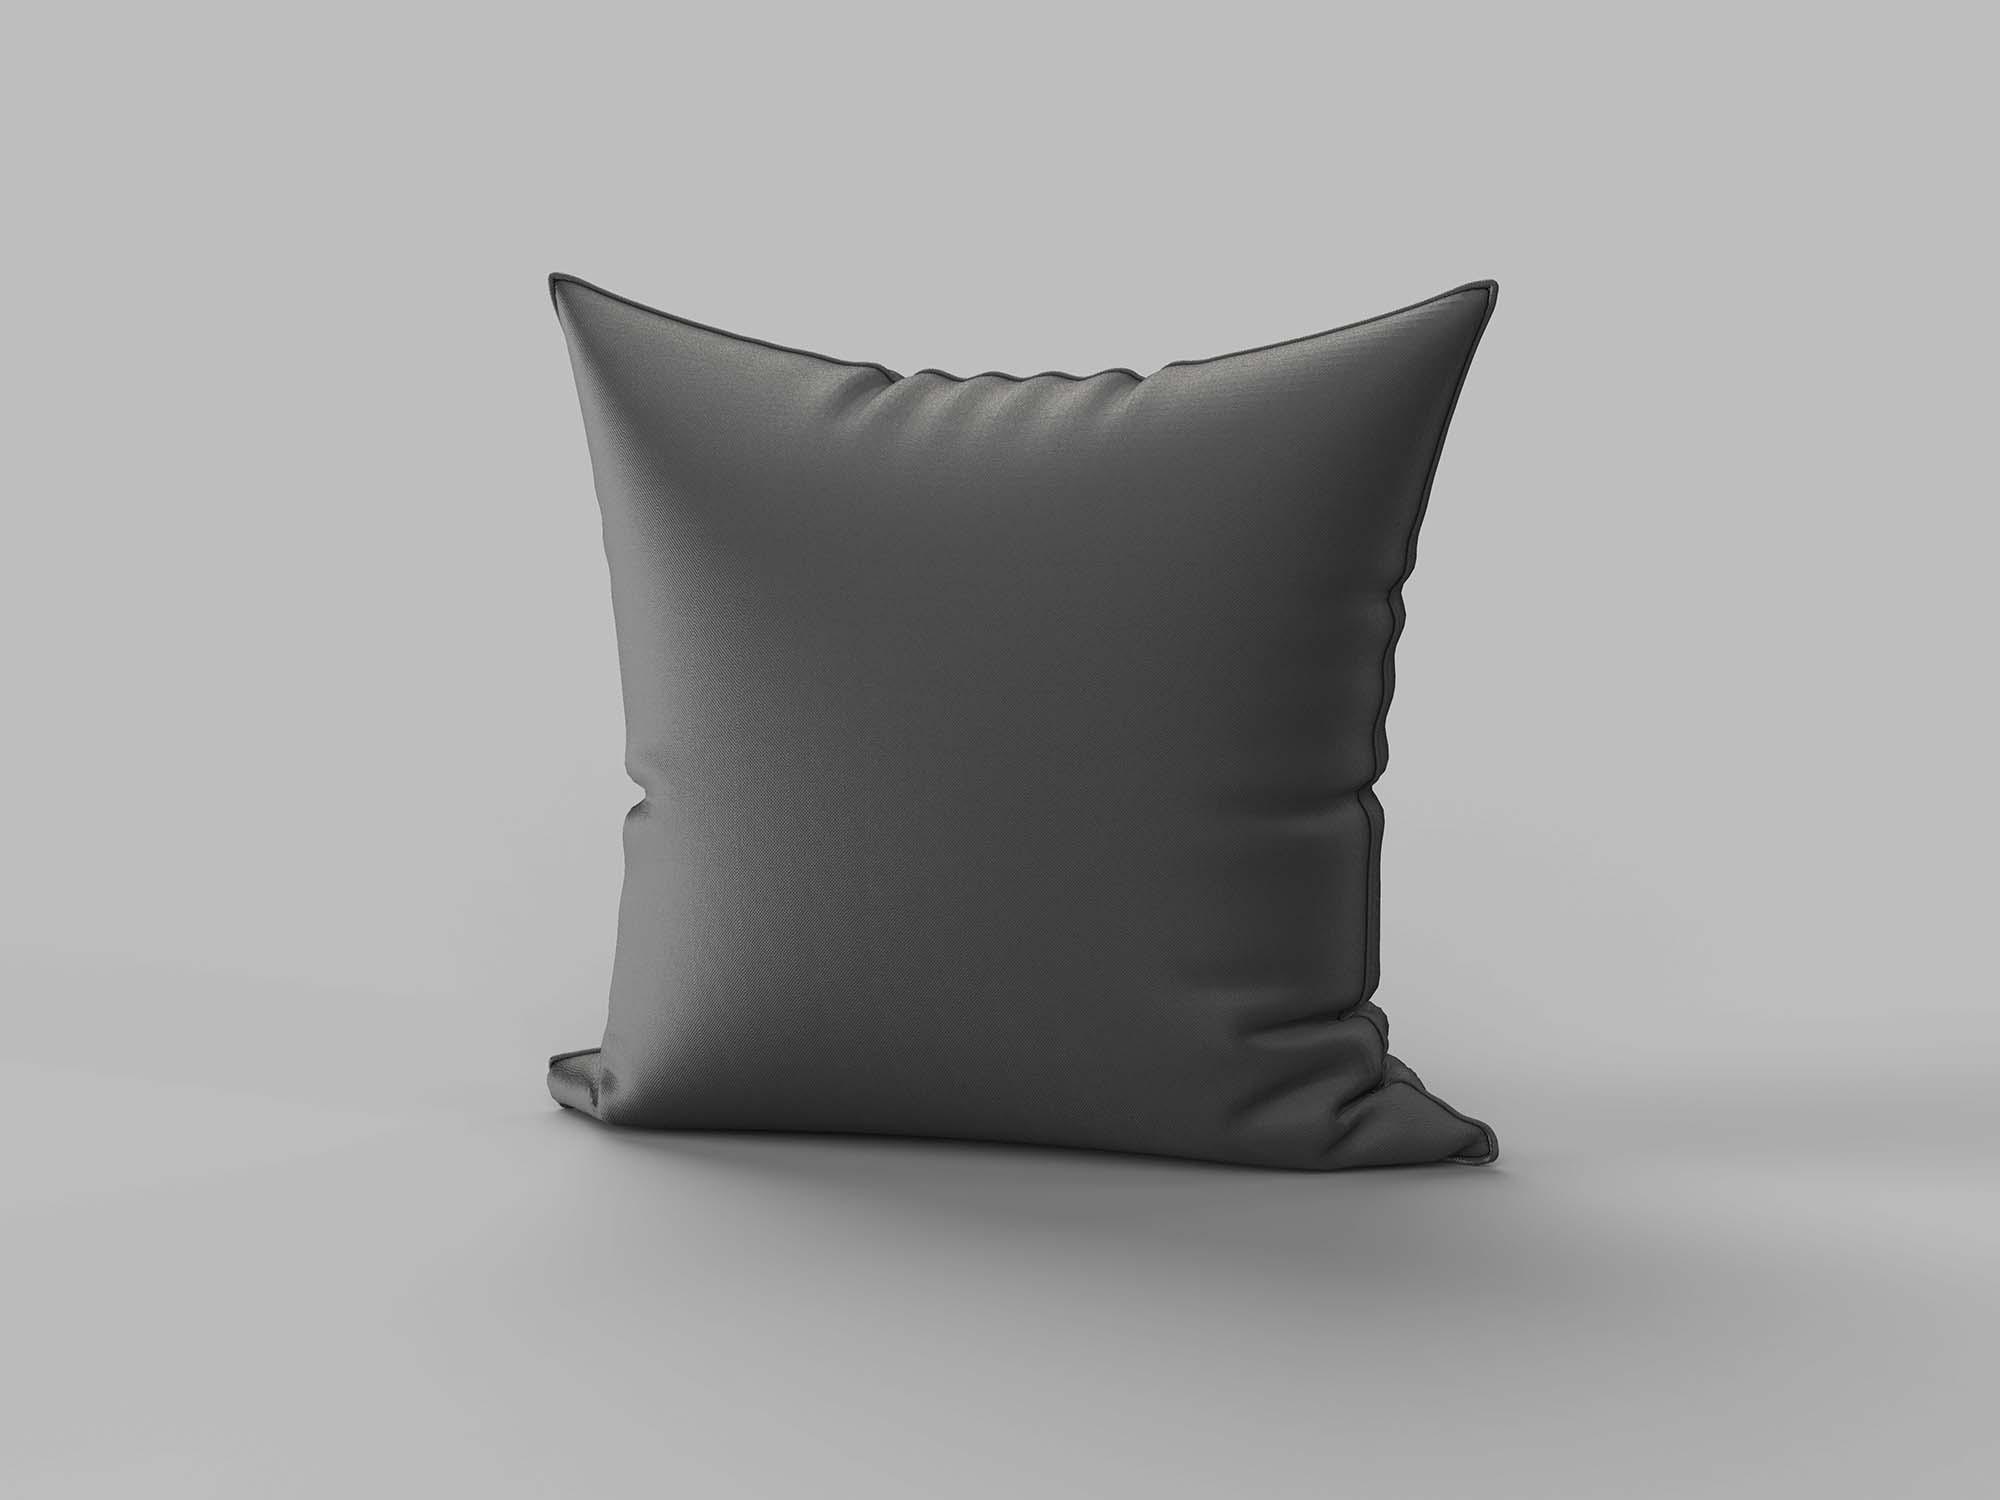 Square Pillow Mockup 2